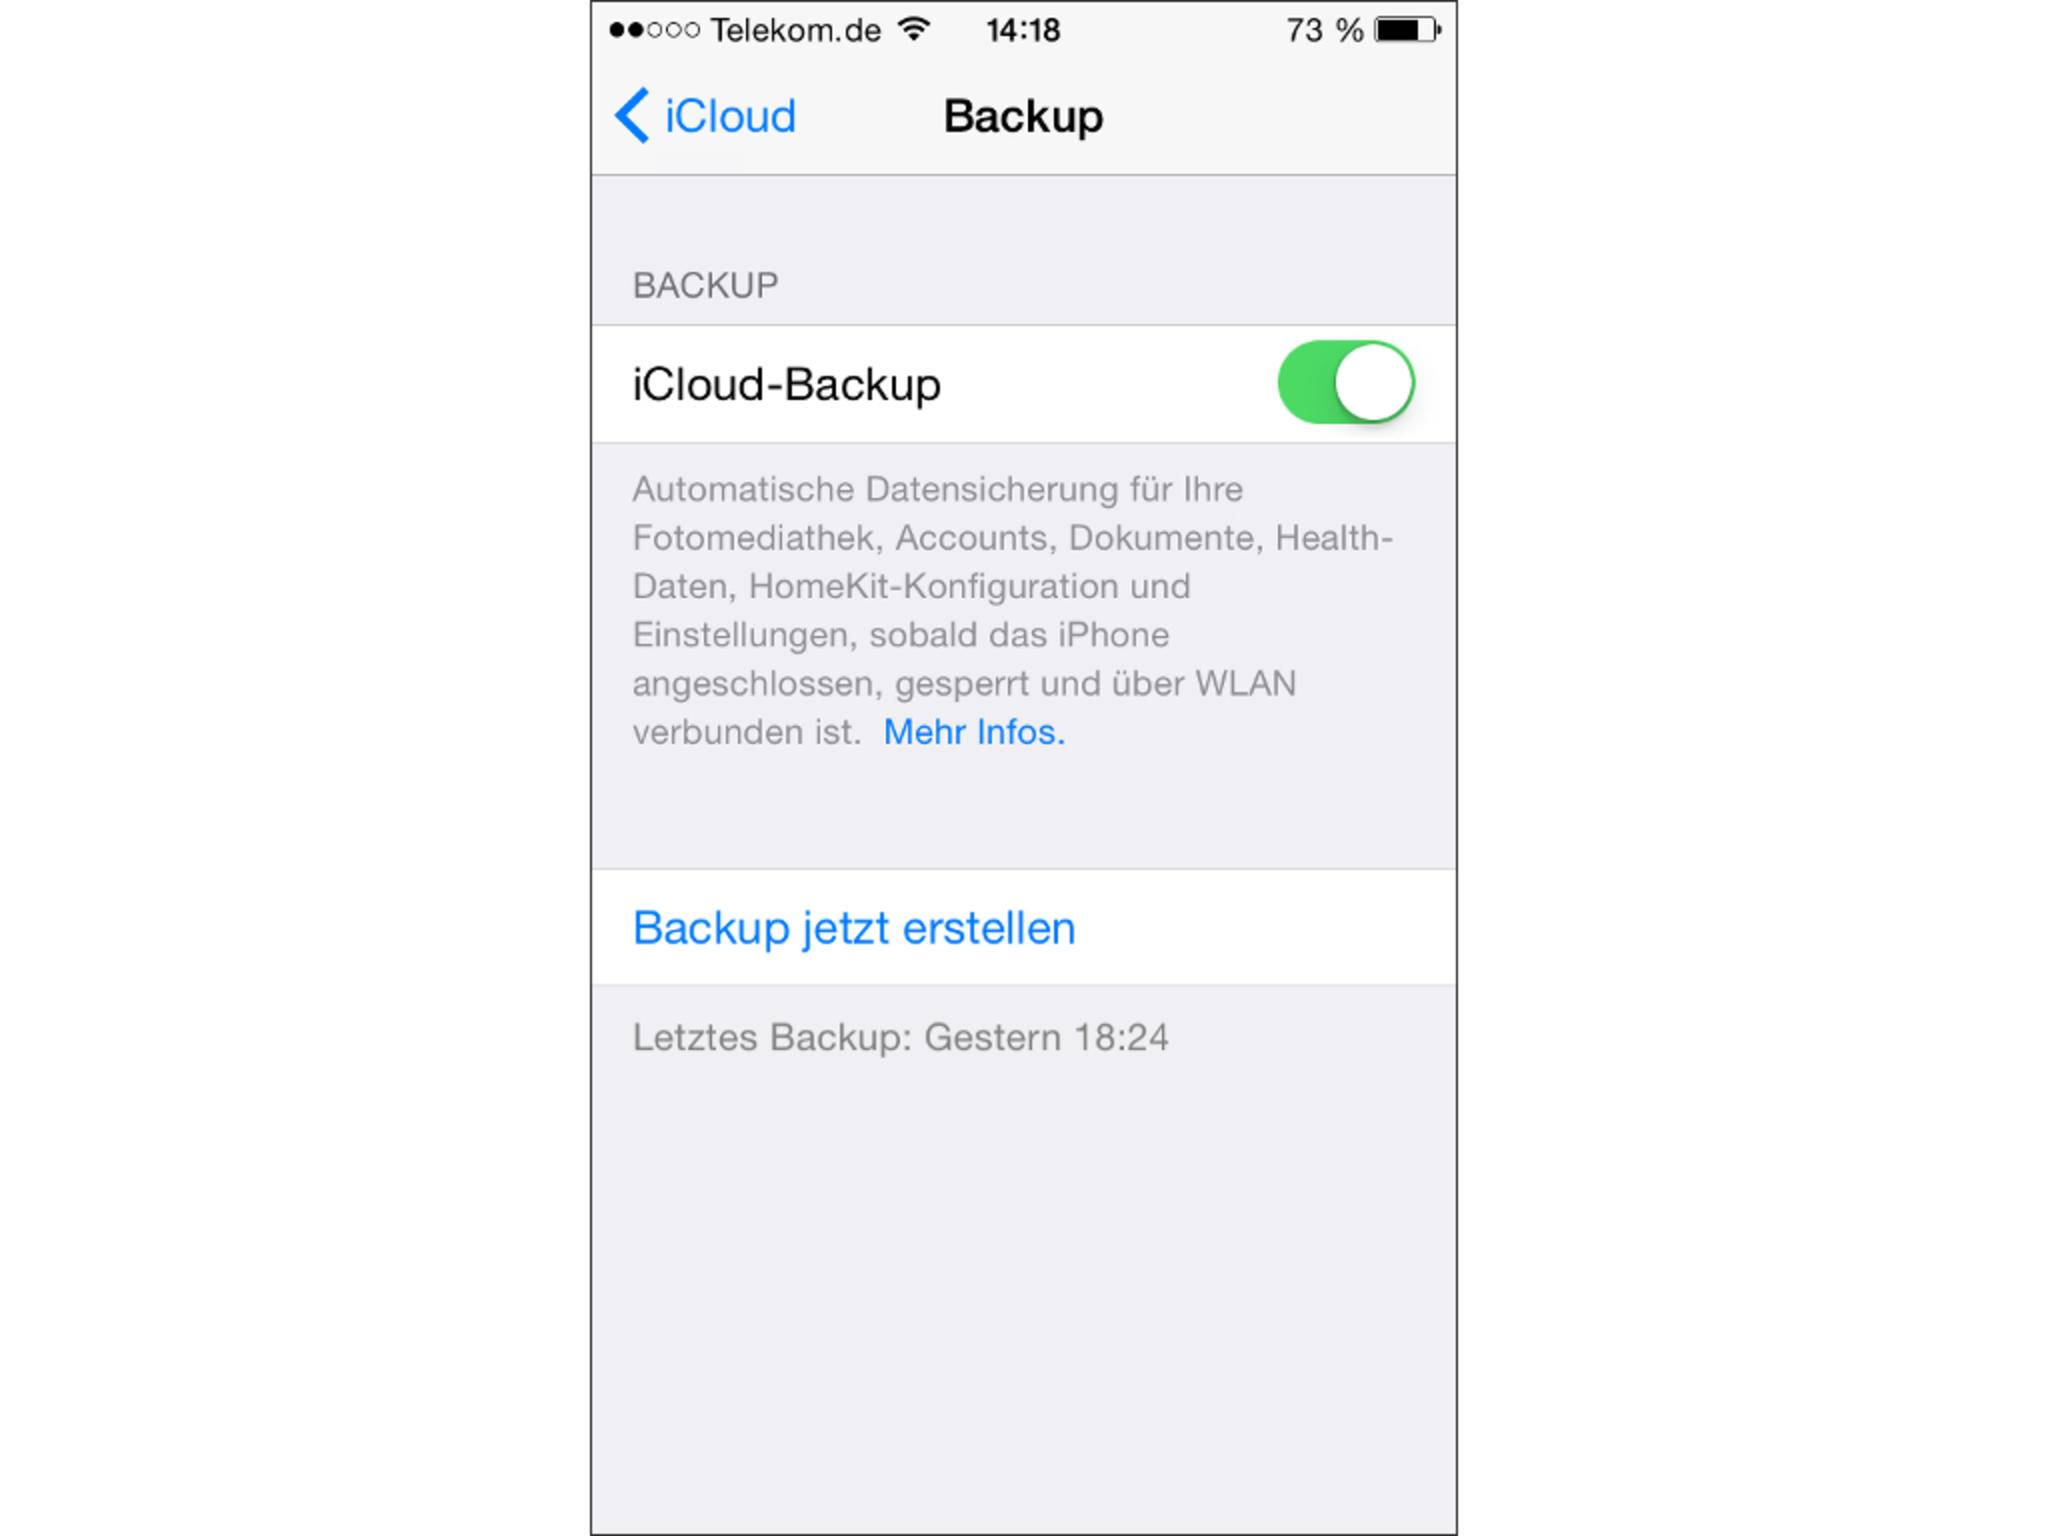 Einmal aktiviert, legt iCloud jeden Tag ein Backup an.